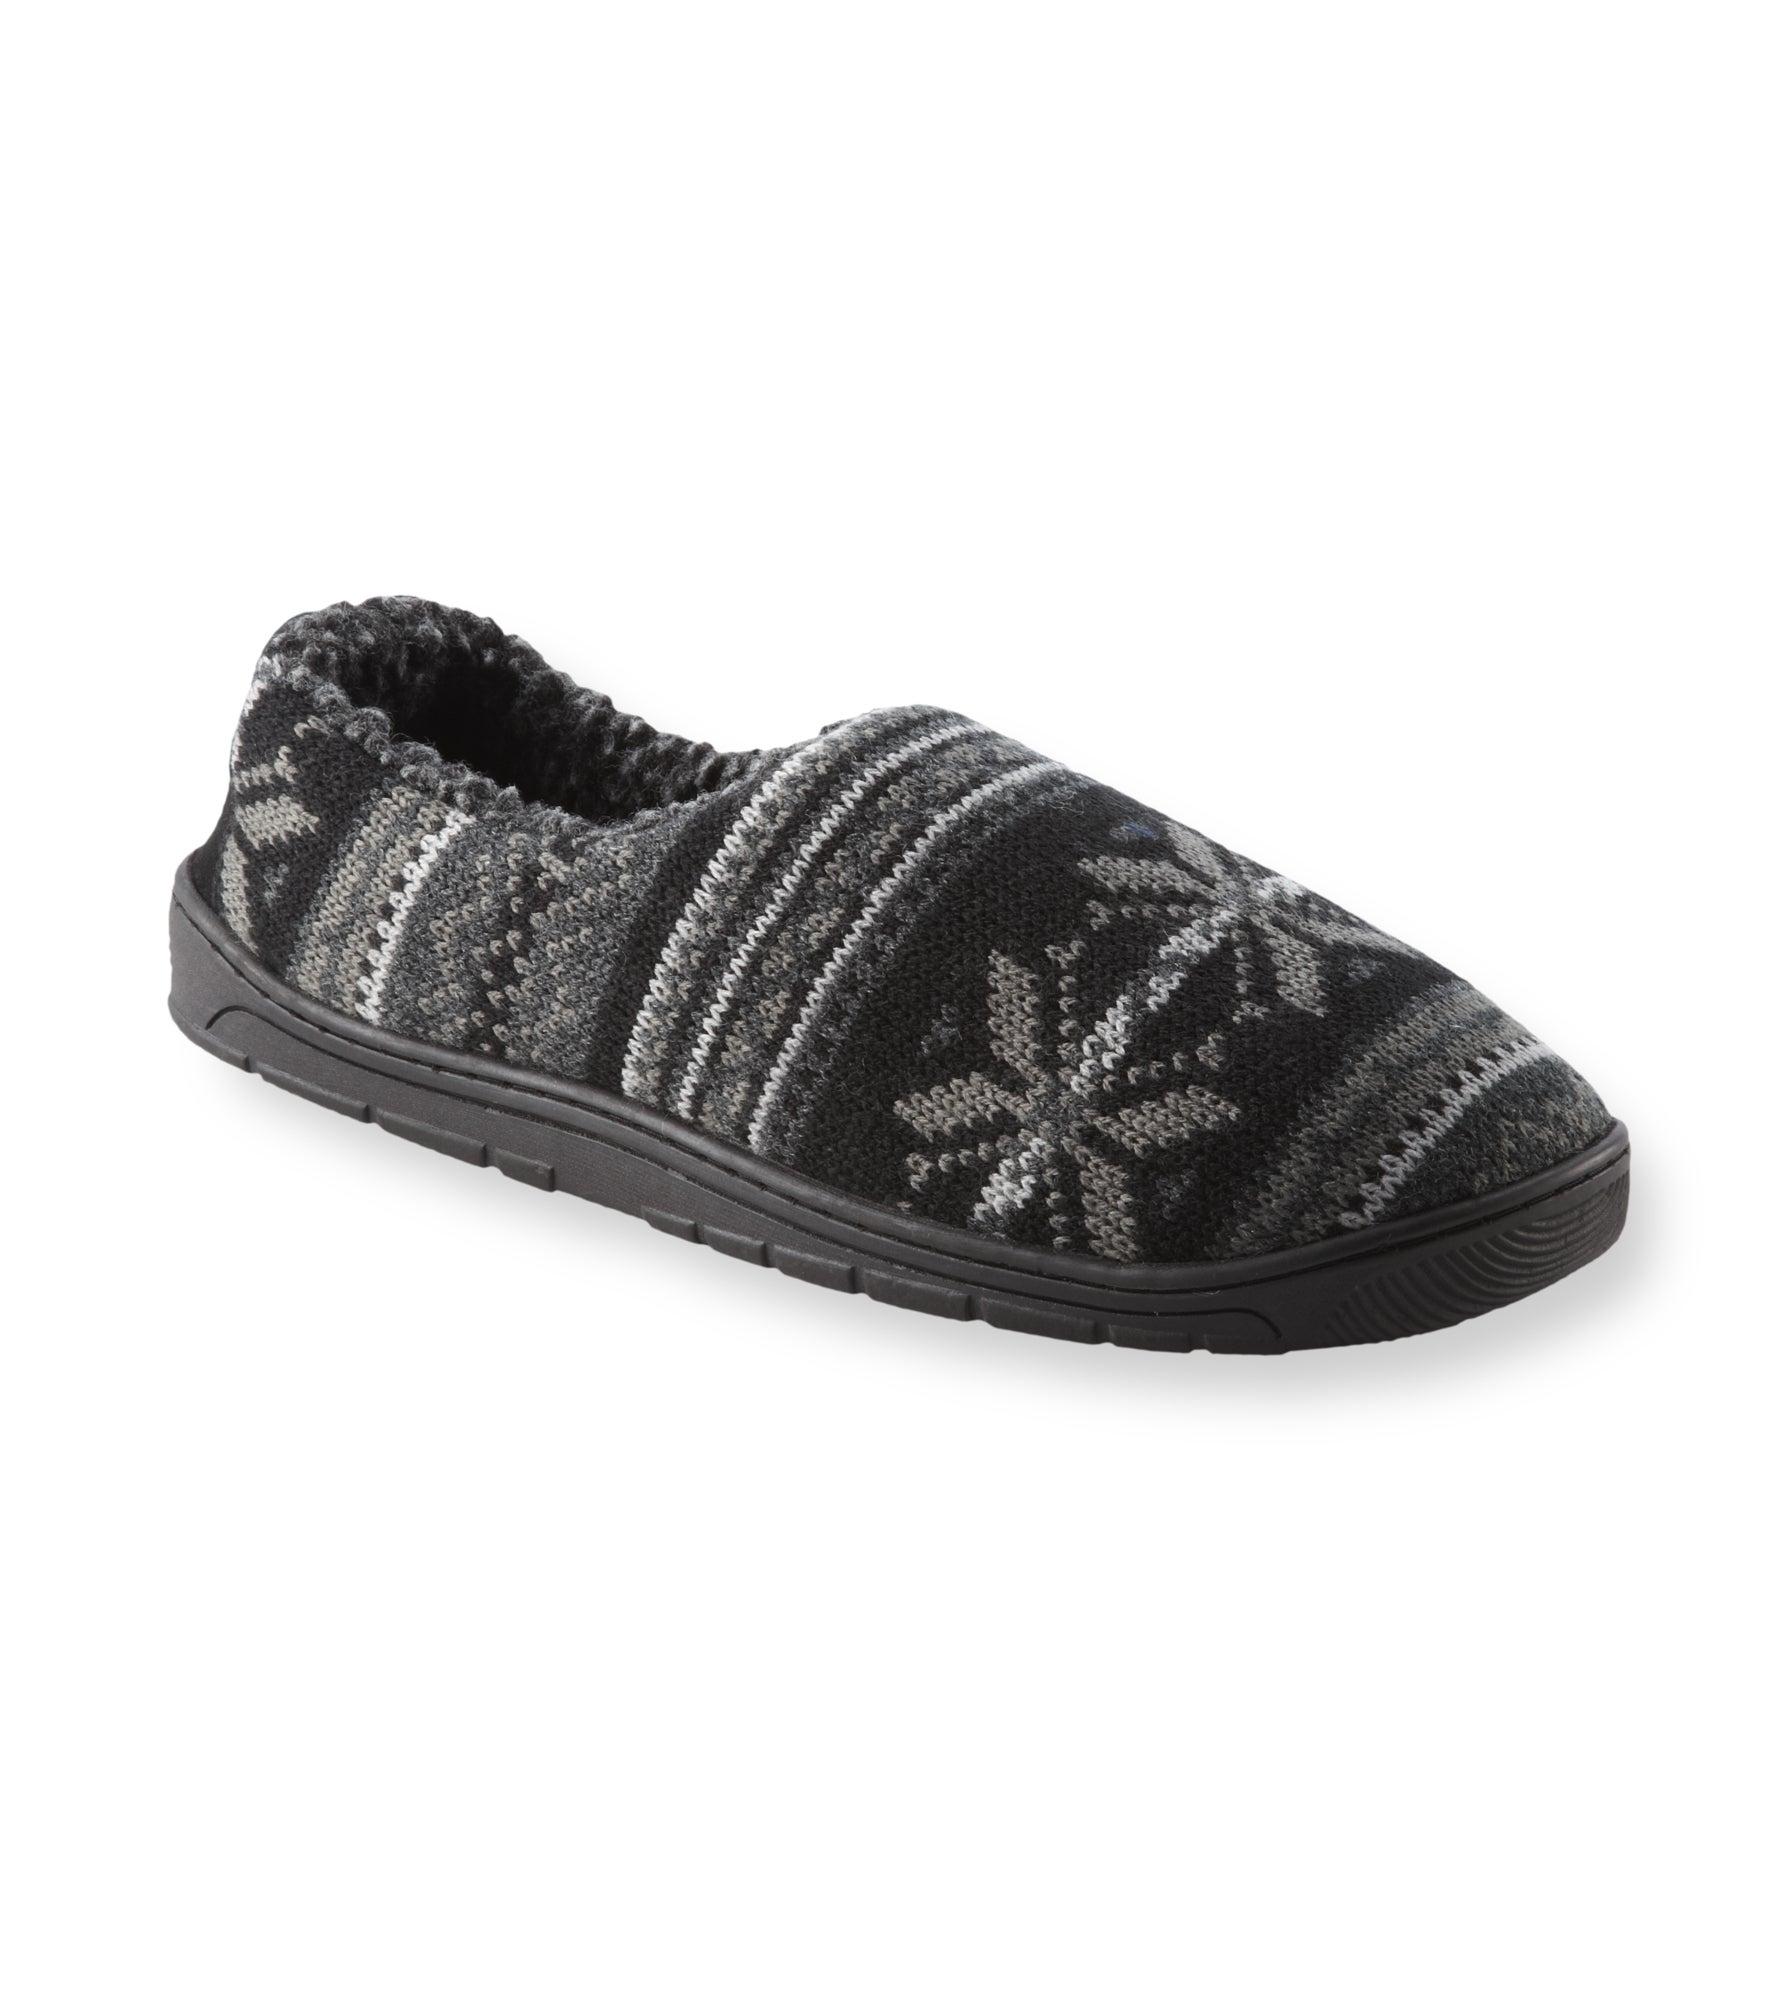 Muk Luks Men's 'John' Black Fairisle Knit Foot Slippers